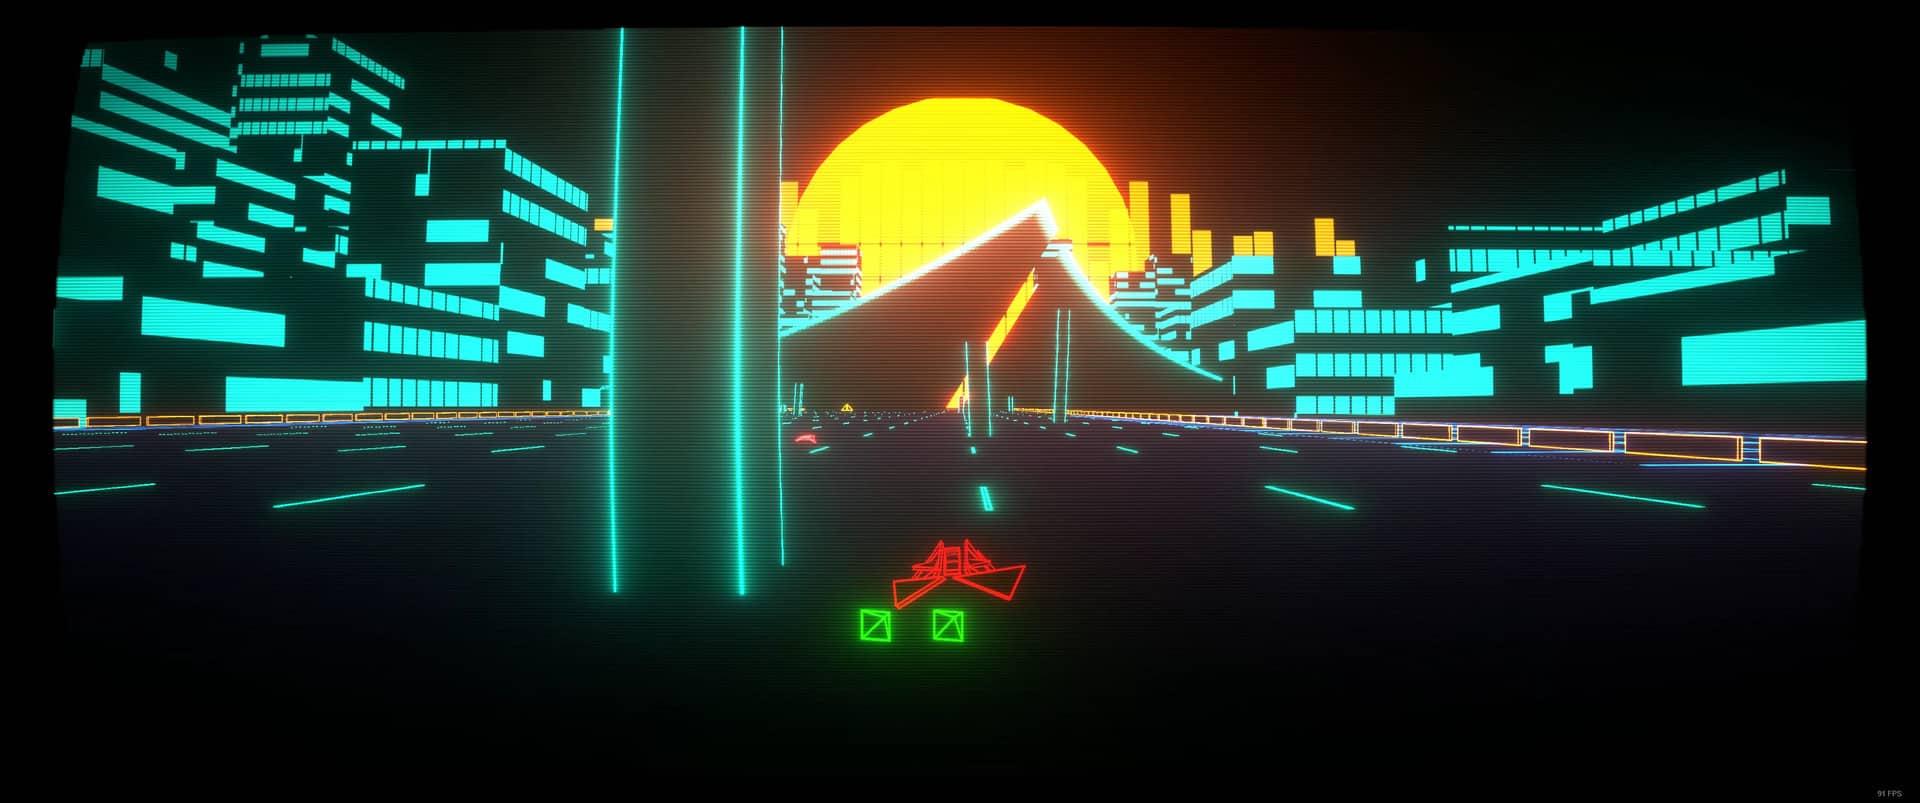 Vecter Taranasus cyberpunk synthwave wireframe retro futuristic racer